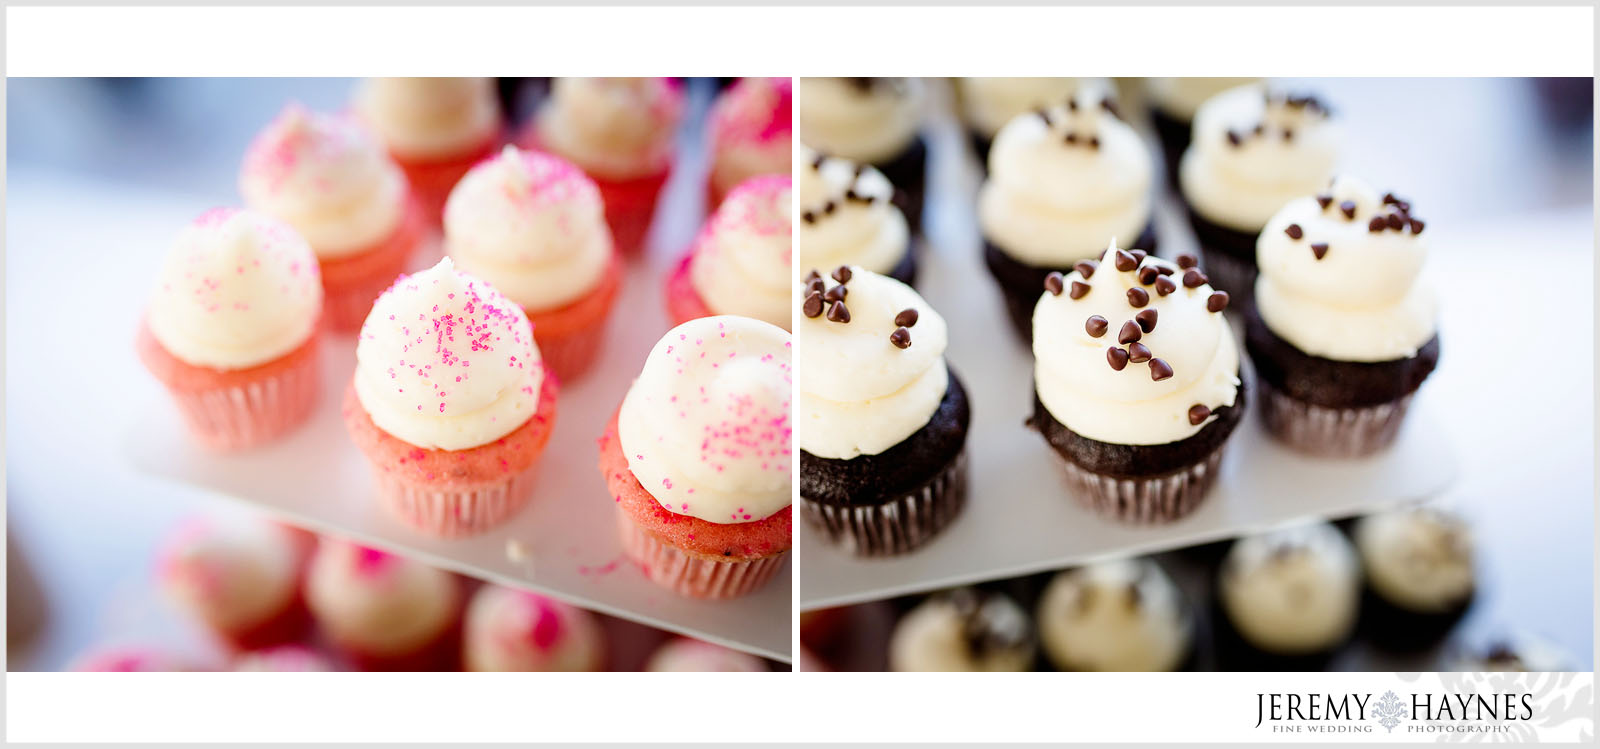 gigis-wedding-cupcakes